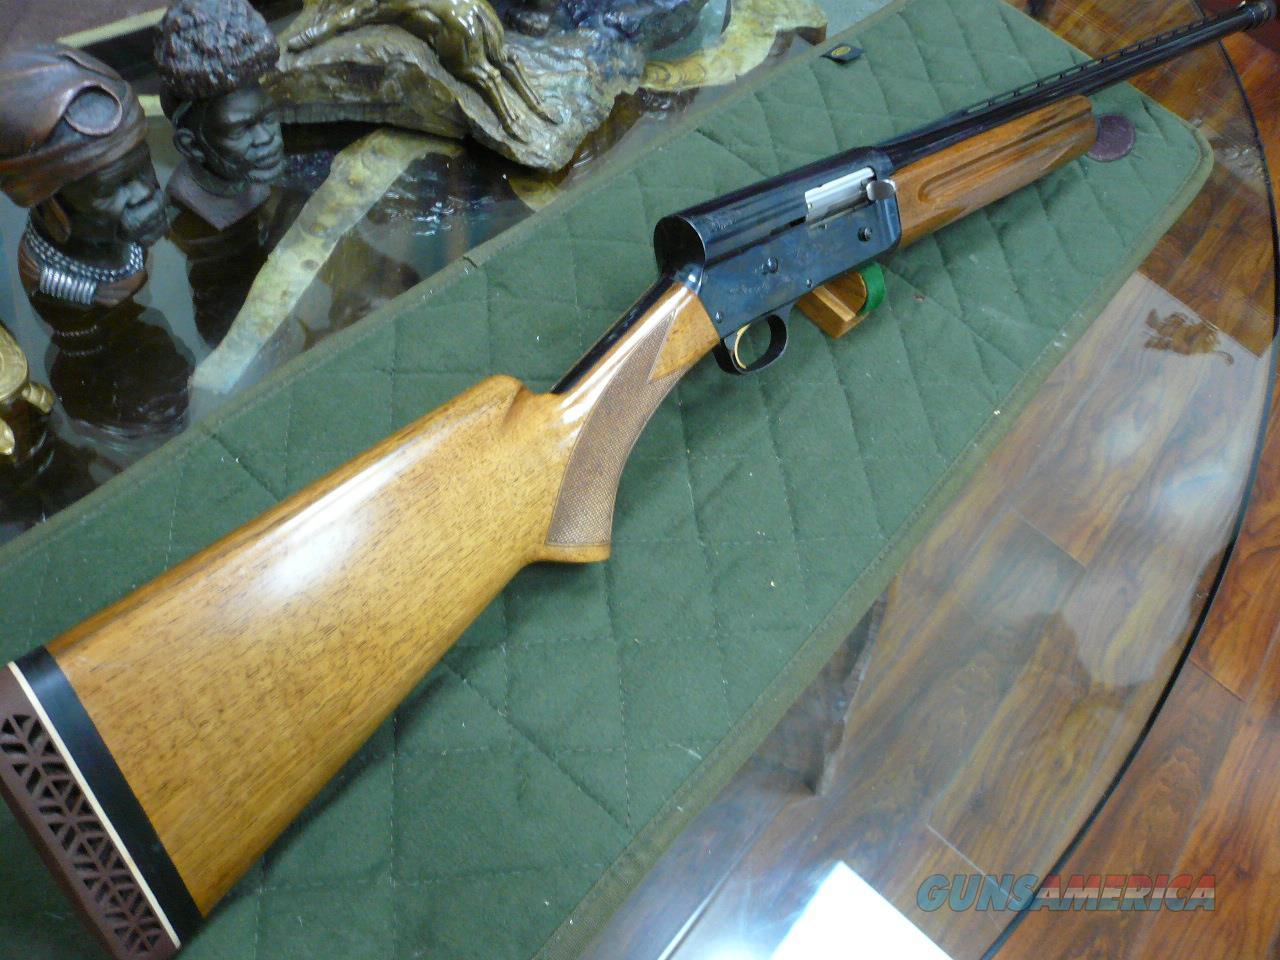 AUTO-5 TWENTY,(1968 Vintage) Belgium 20Ga  Guns > Shotguns > Browning Shotguns > Autoloaders > Hunting